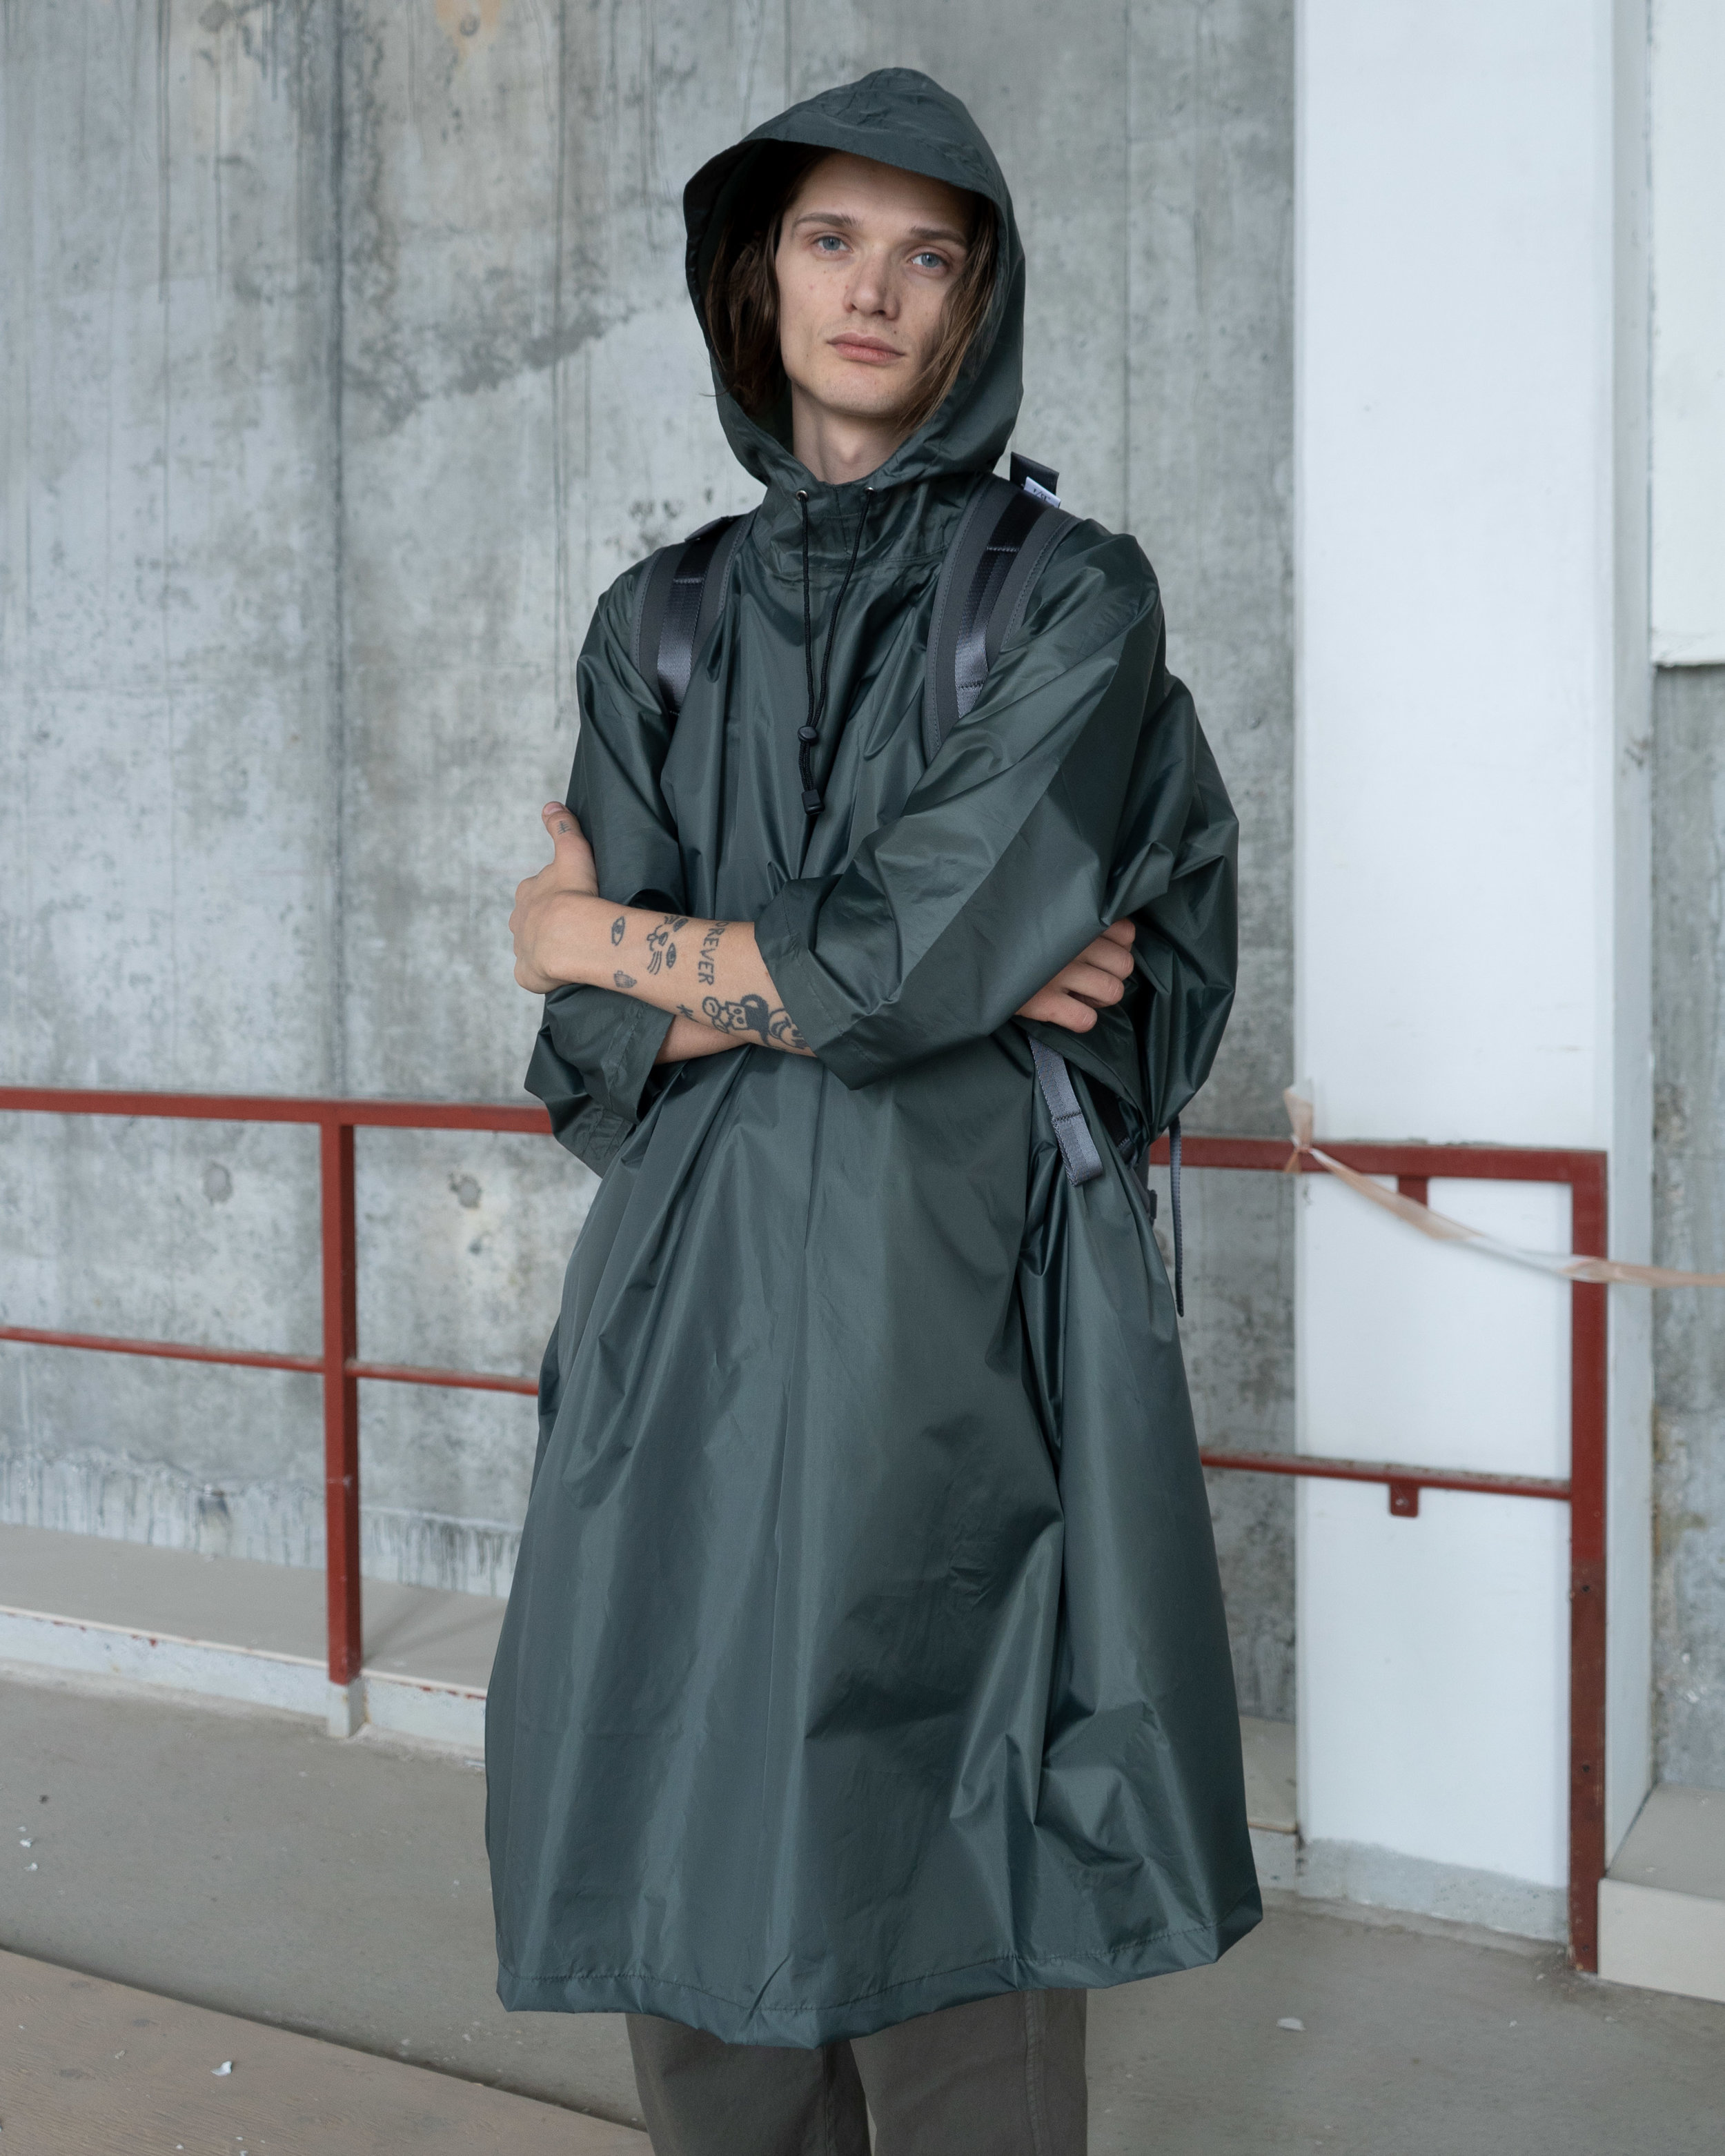 Carhartt WIP - Rain Poncho   Carhartt WIP - Lawton Pant   F/CE - No Seam Zip Lock Bag